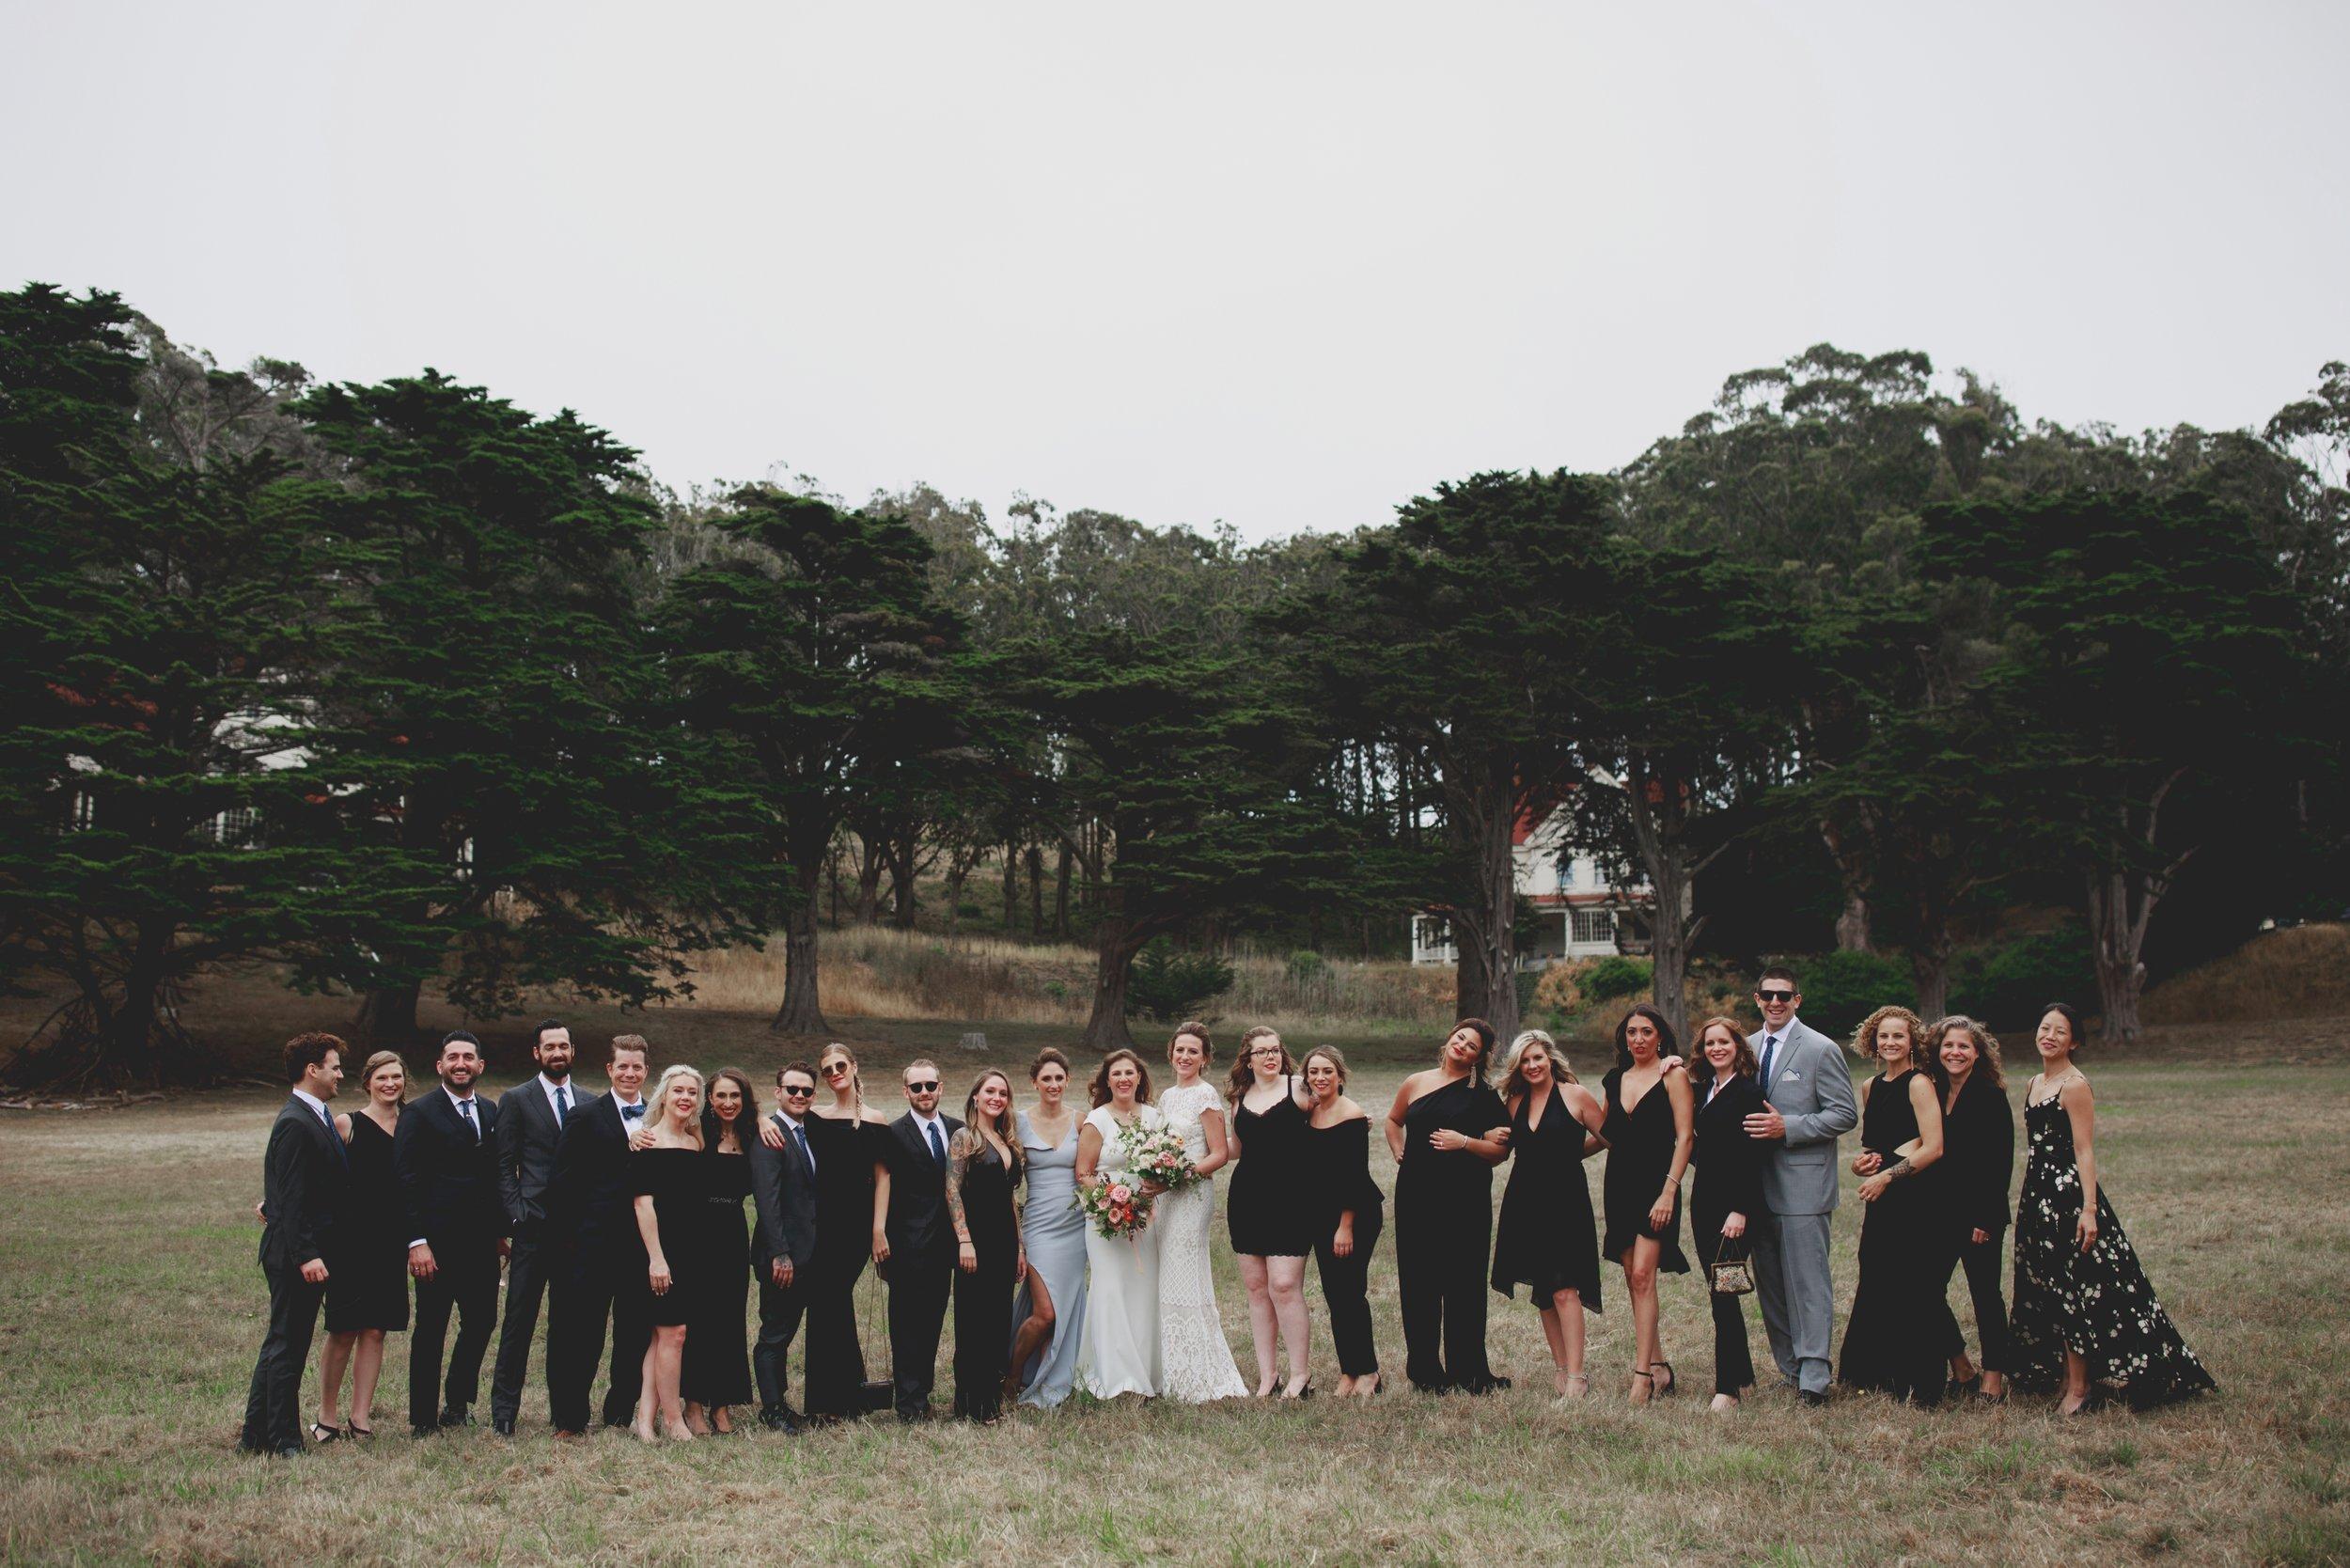 amandavanvels_headlands_center_wedding_san_francisco_050.jpg